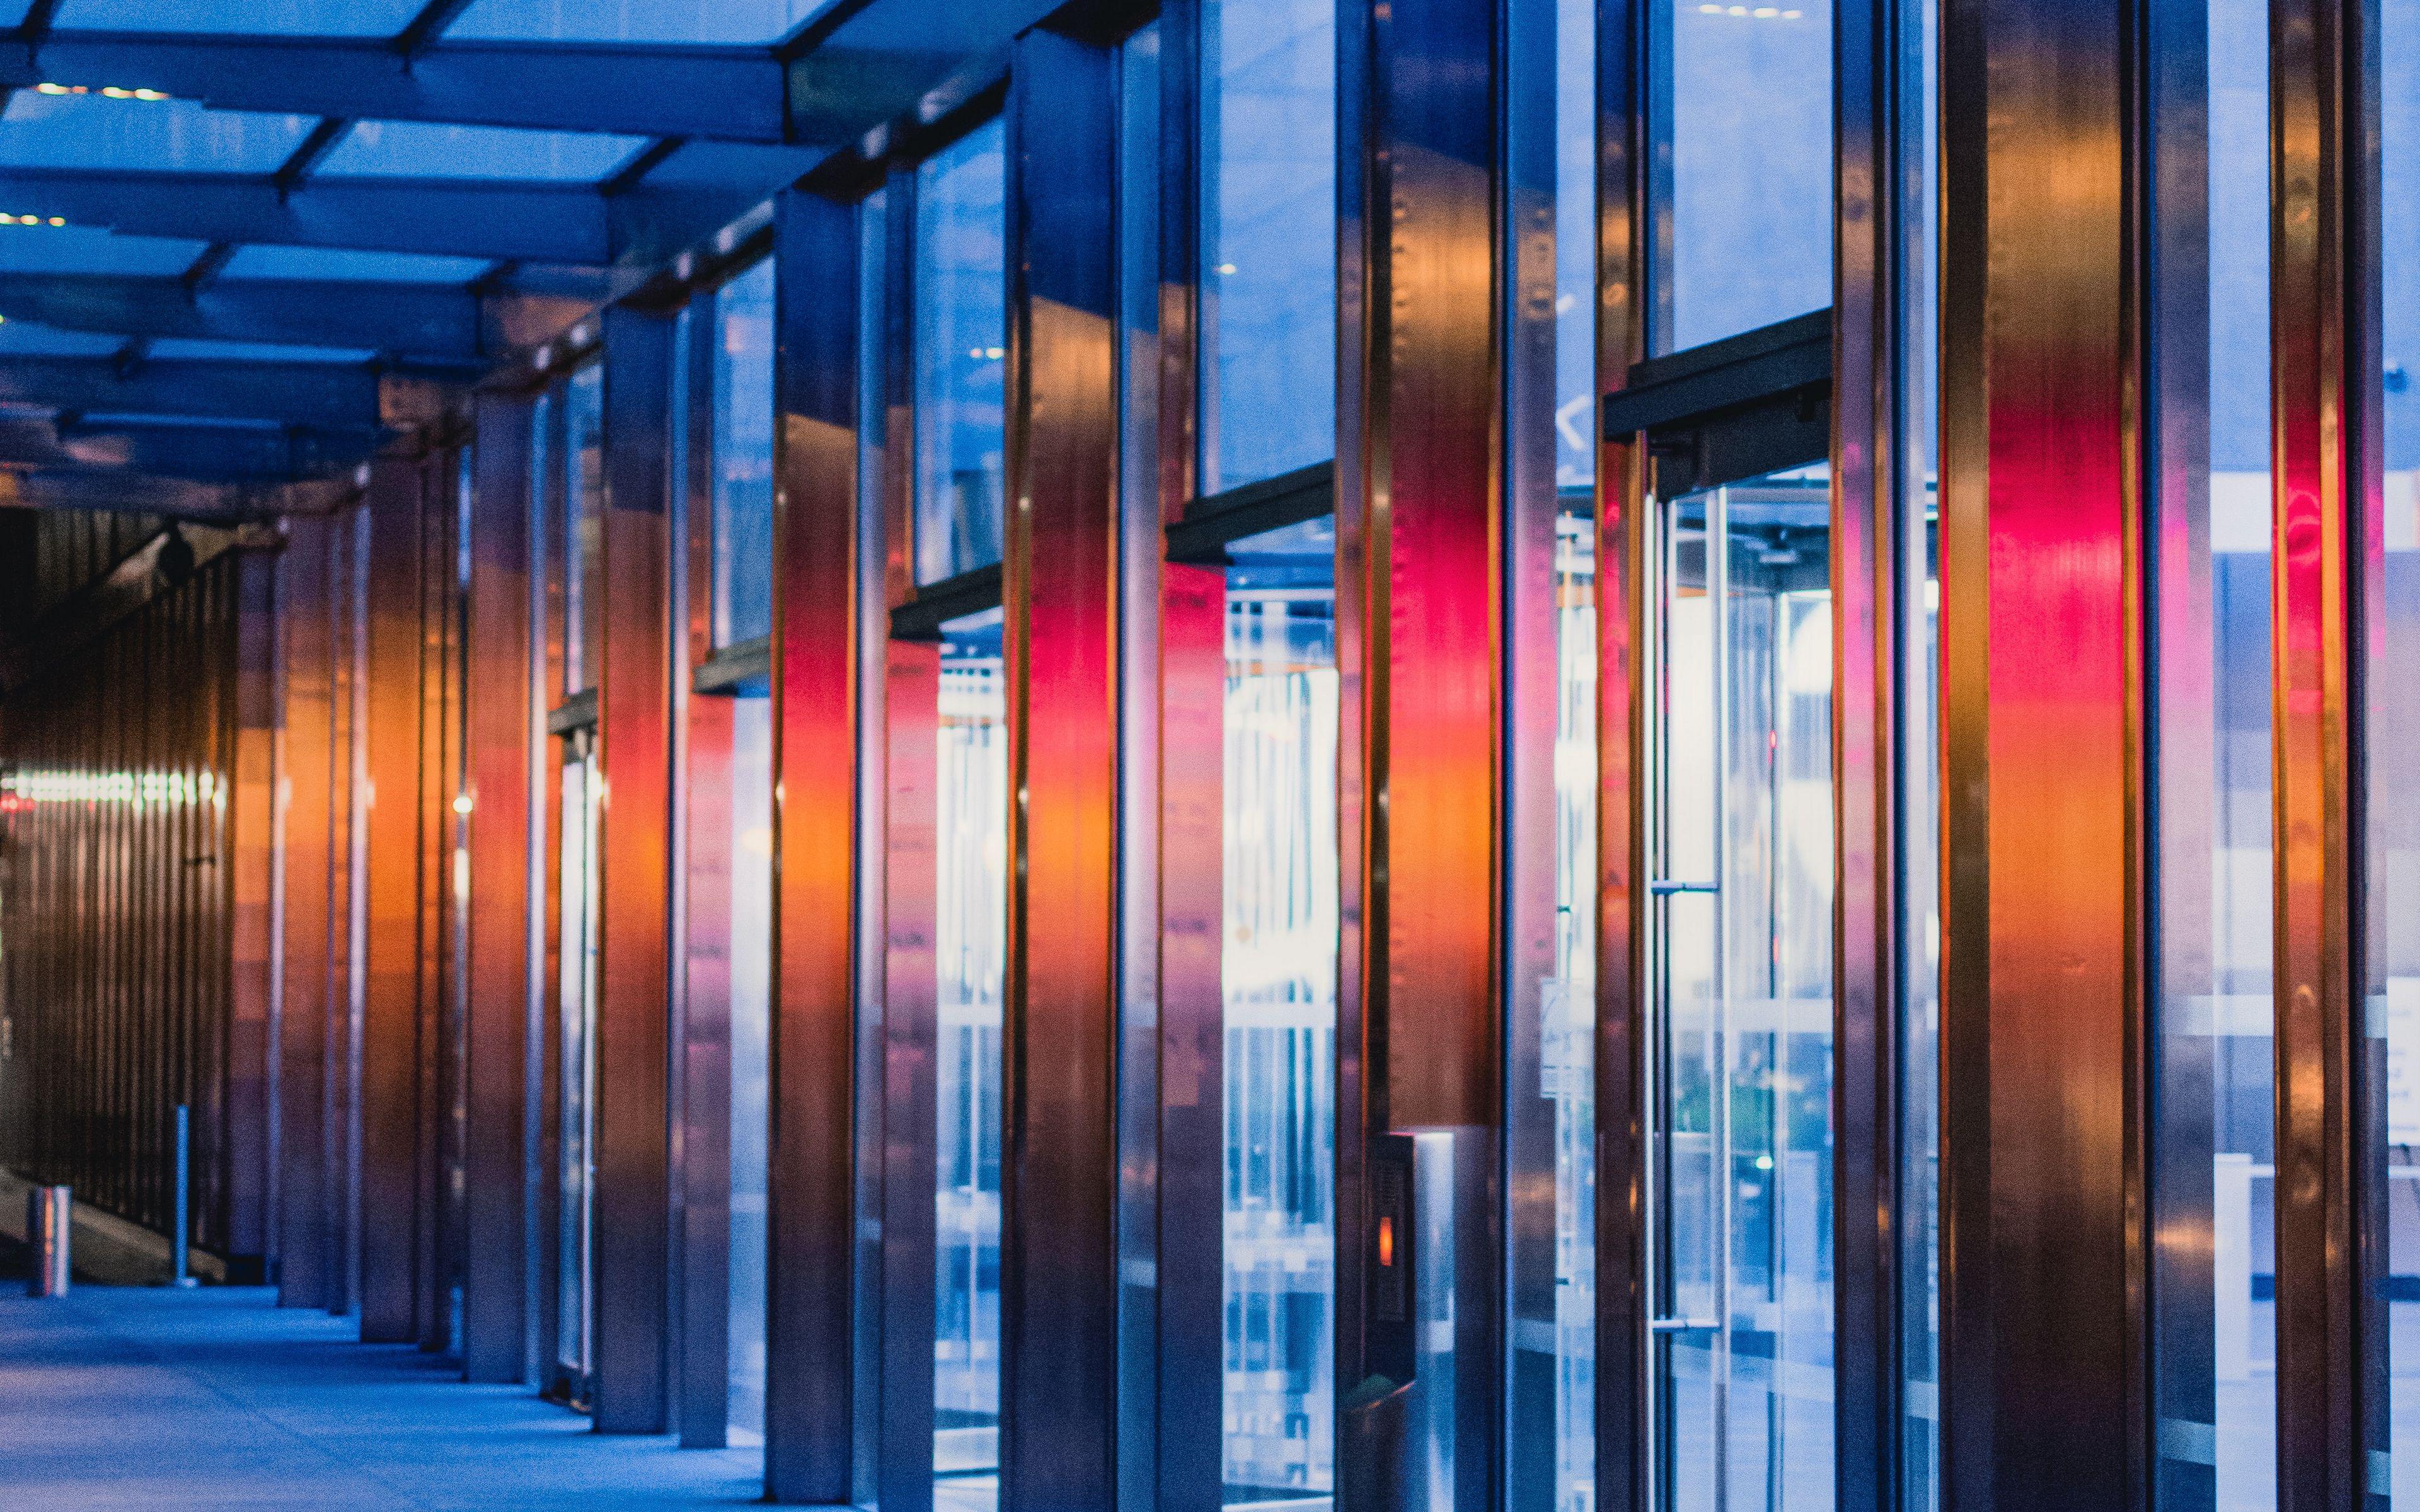 3840x2400 Wallpaper building, architecture, doors, glass, backlight